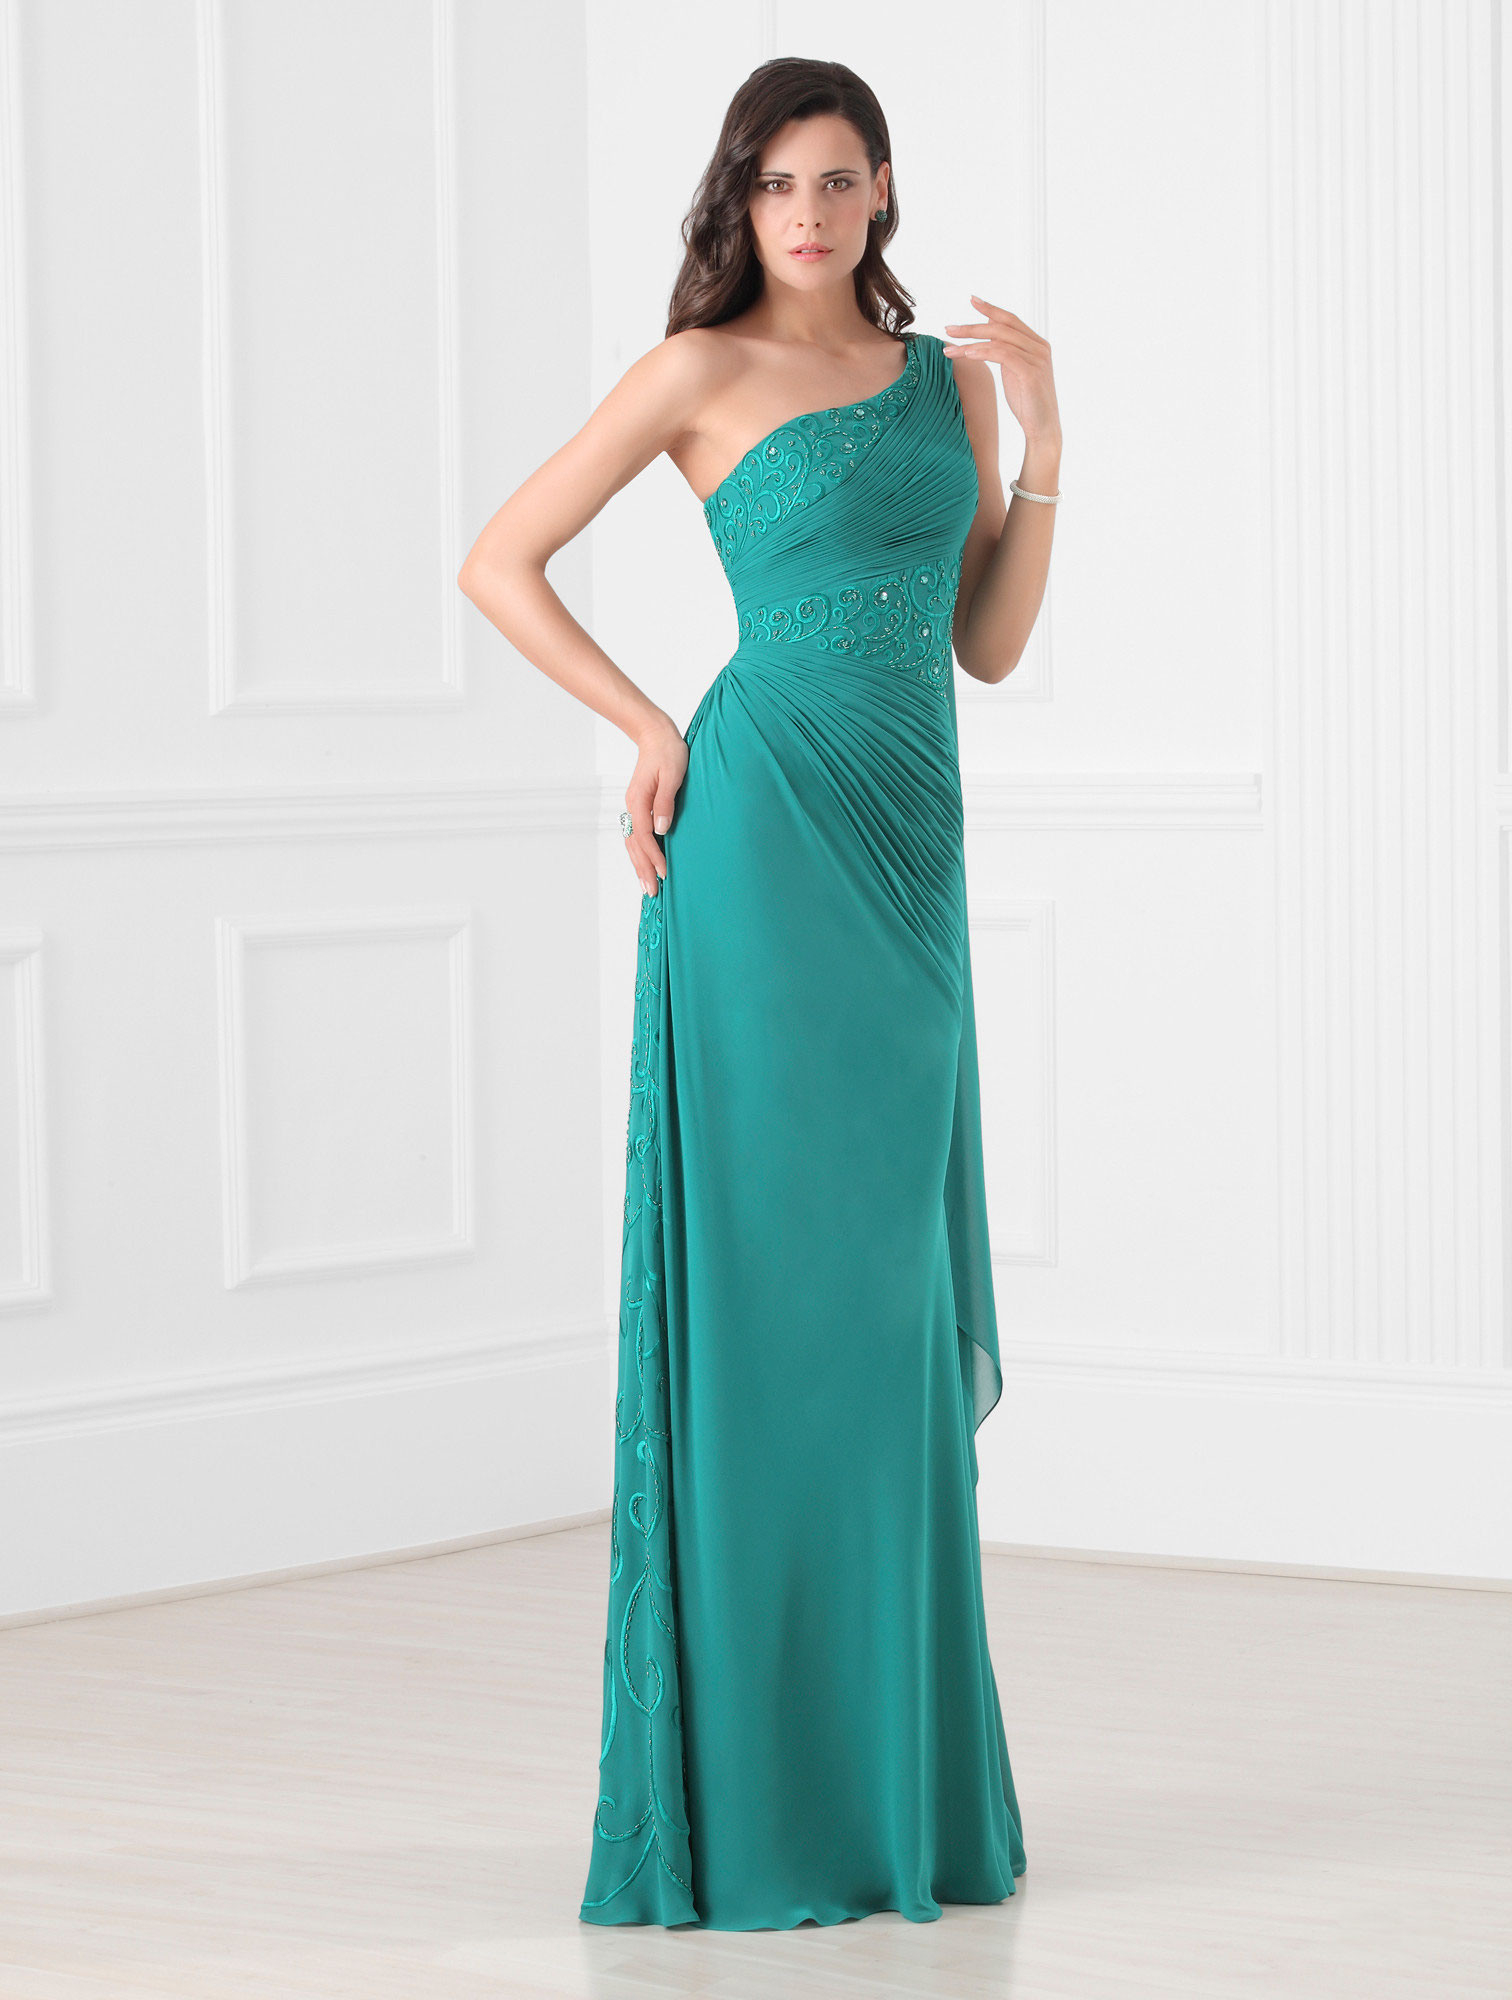 Formal Genial Abendkleider Basel Boutique Elegant Abendkleider Basel für 2019